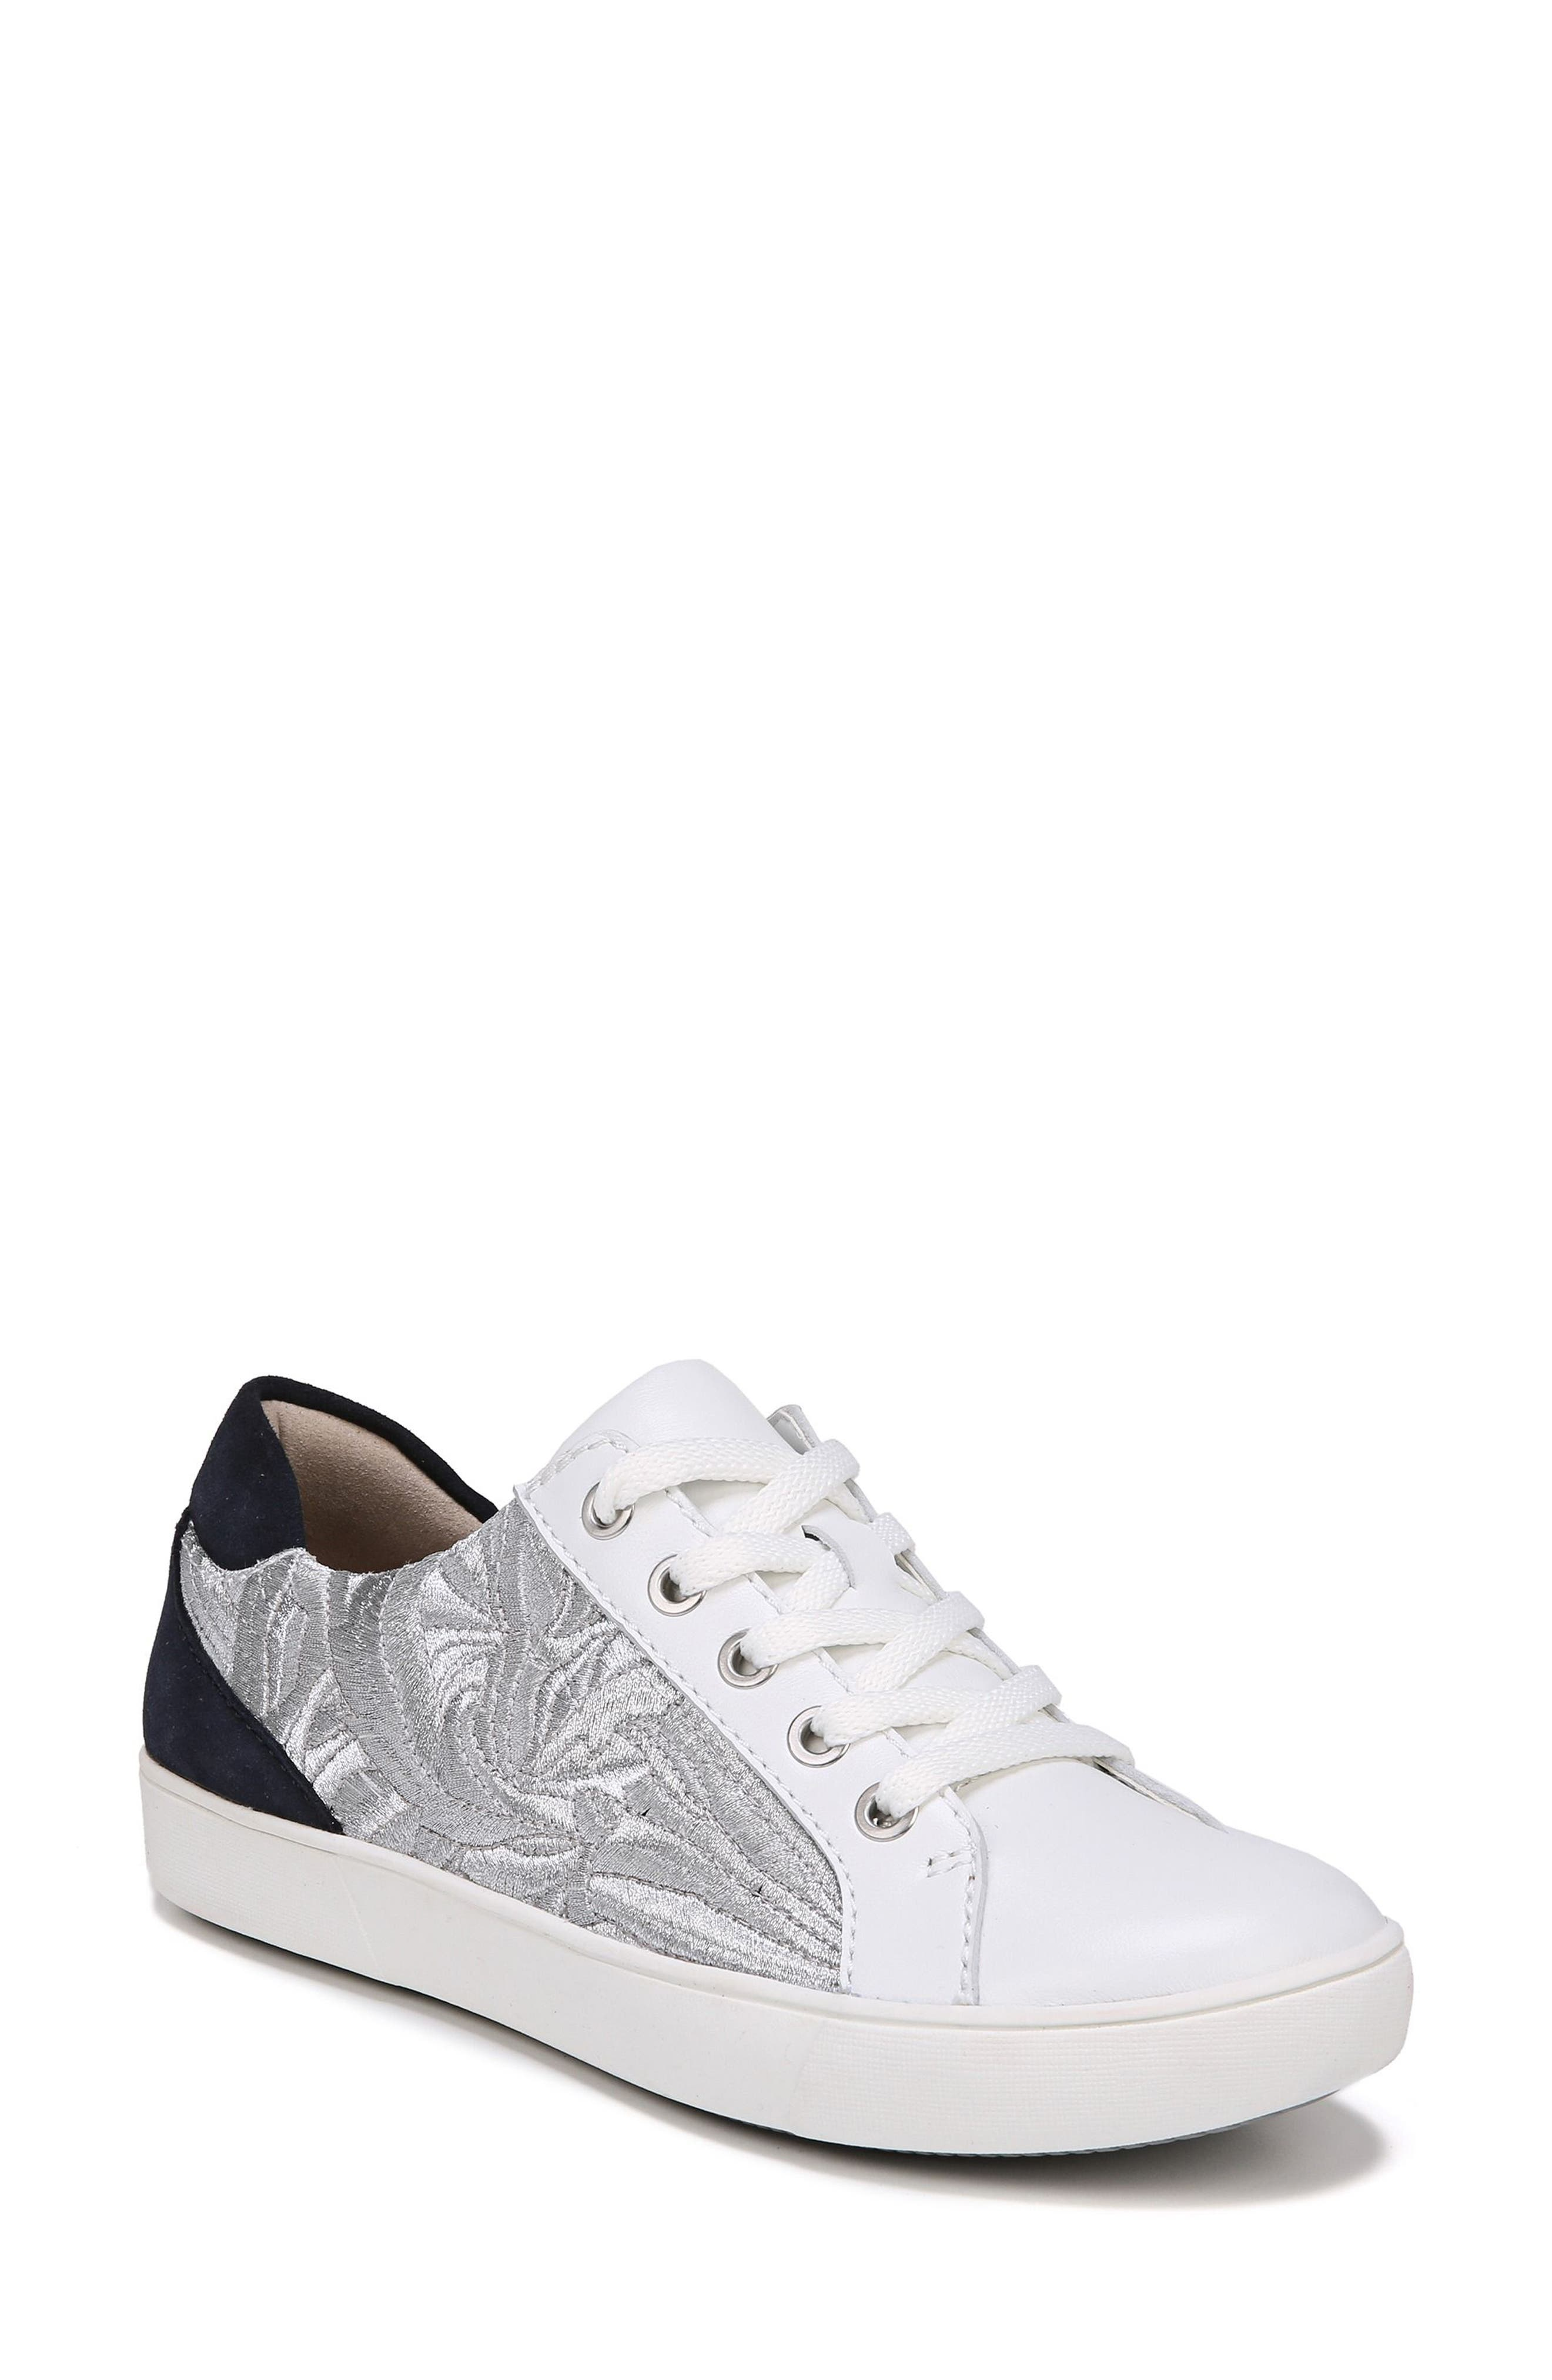 Morrison Sneaker,                         Main,                         color, White/ Silver Leather